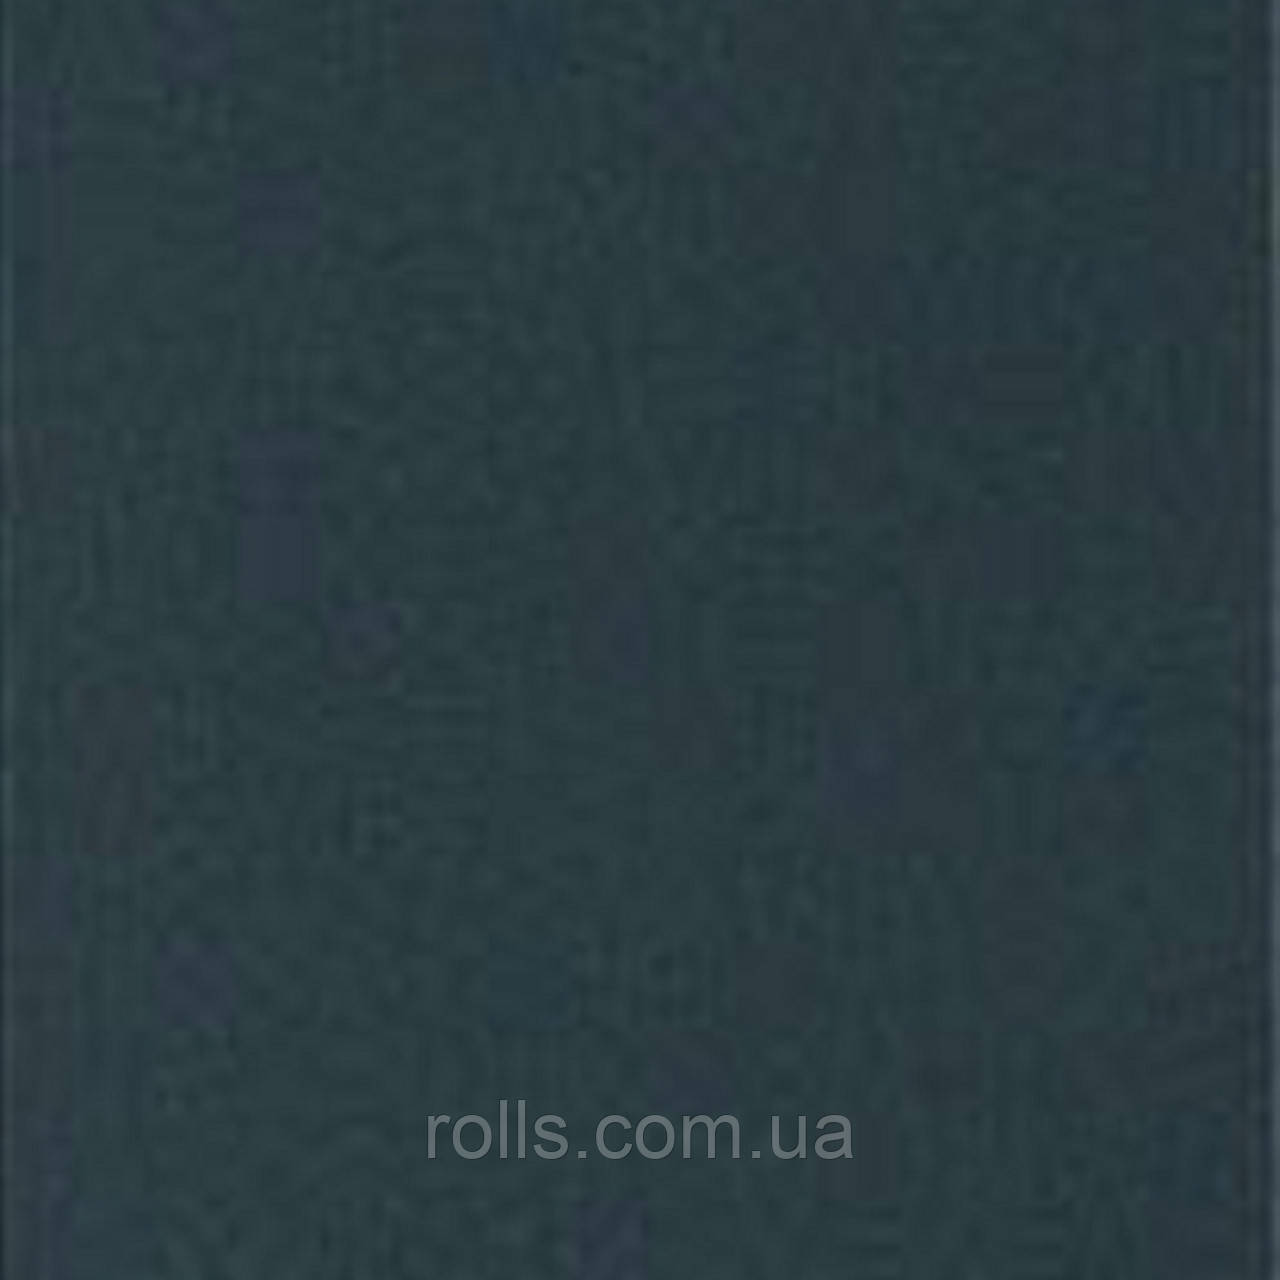 "Алюминиевый лист плоский Prefalz P.10 №02 ANTHRAZIT ""АНТРАЦИТ"" RAL7016 ""ANTHRACITE"" 0,7х1000х2000мм"